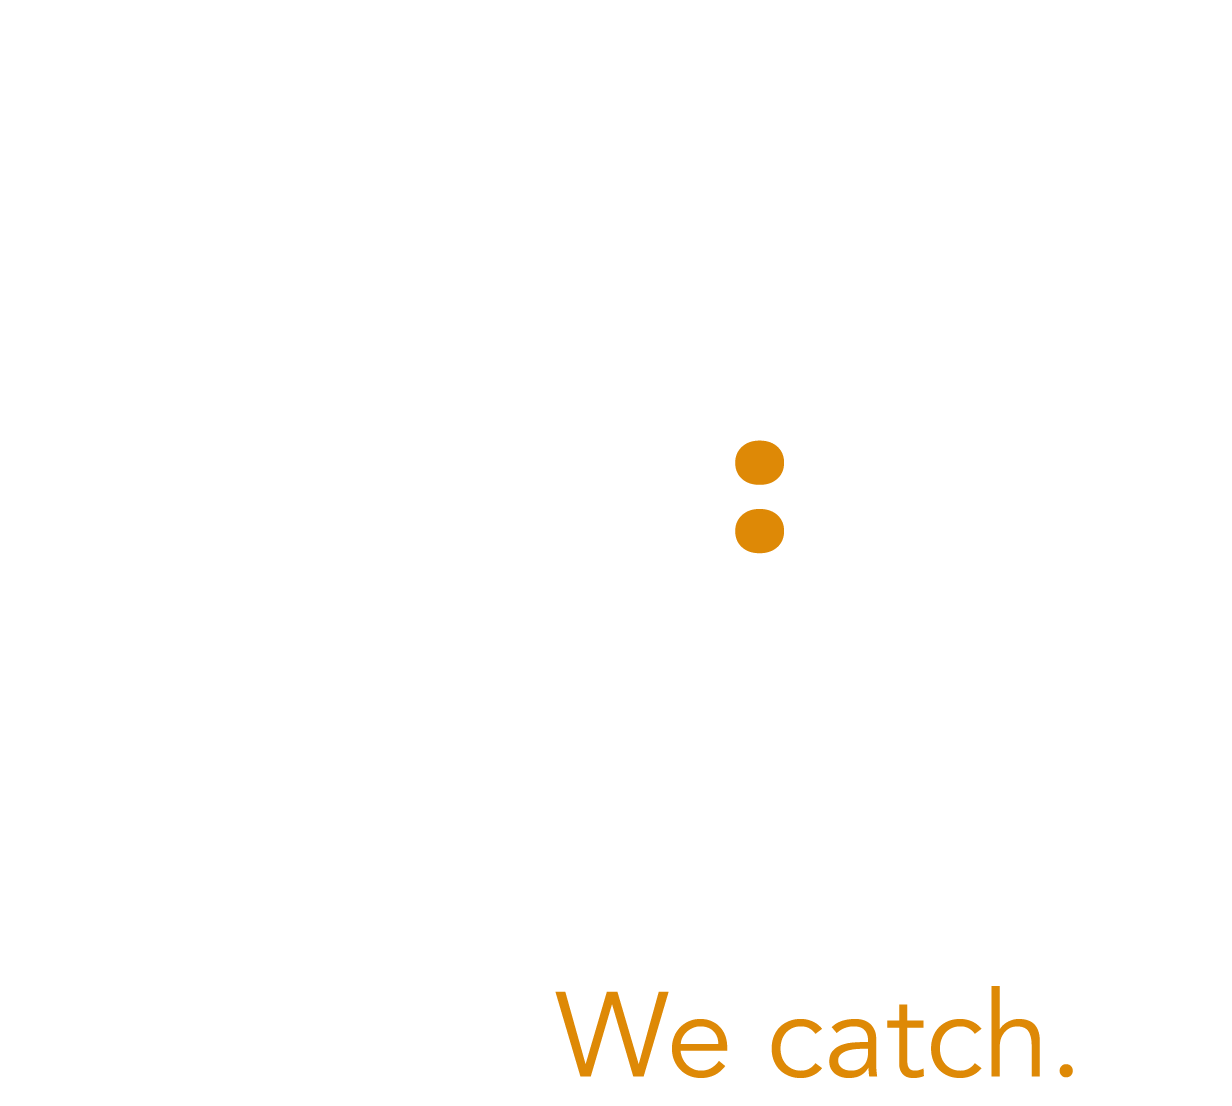 smeup lab